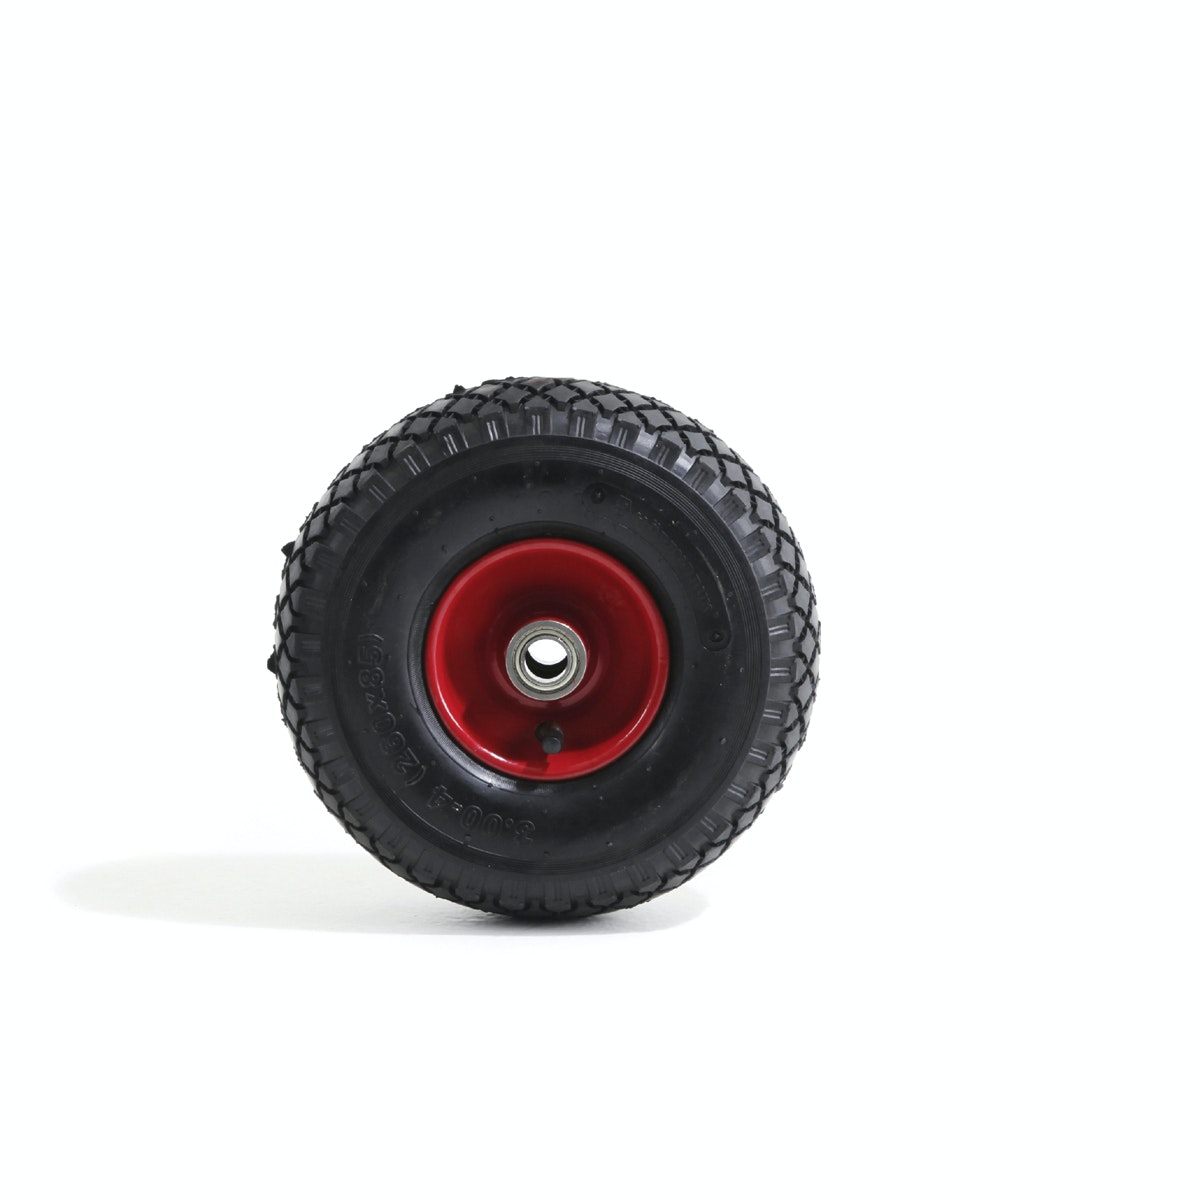 Skottkärrehjul Hörby bruk 74072